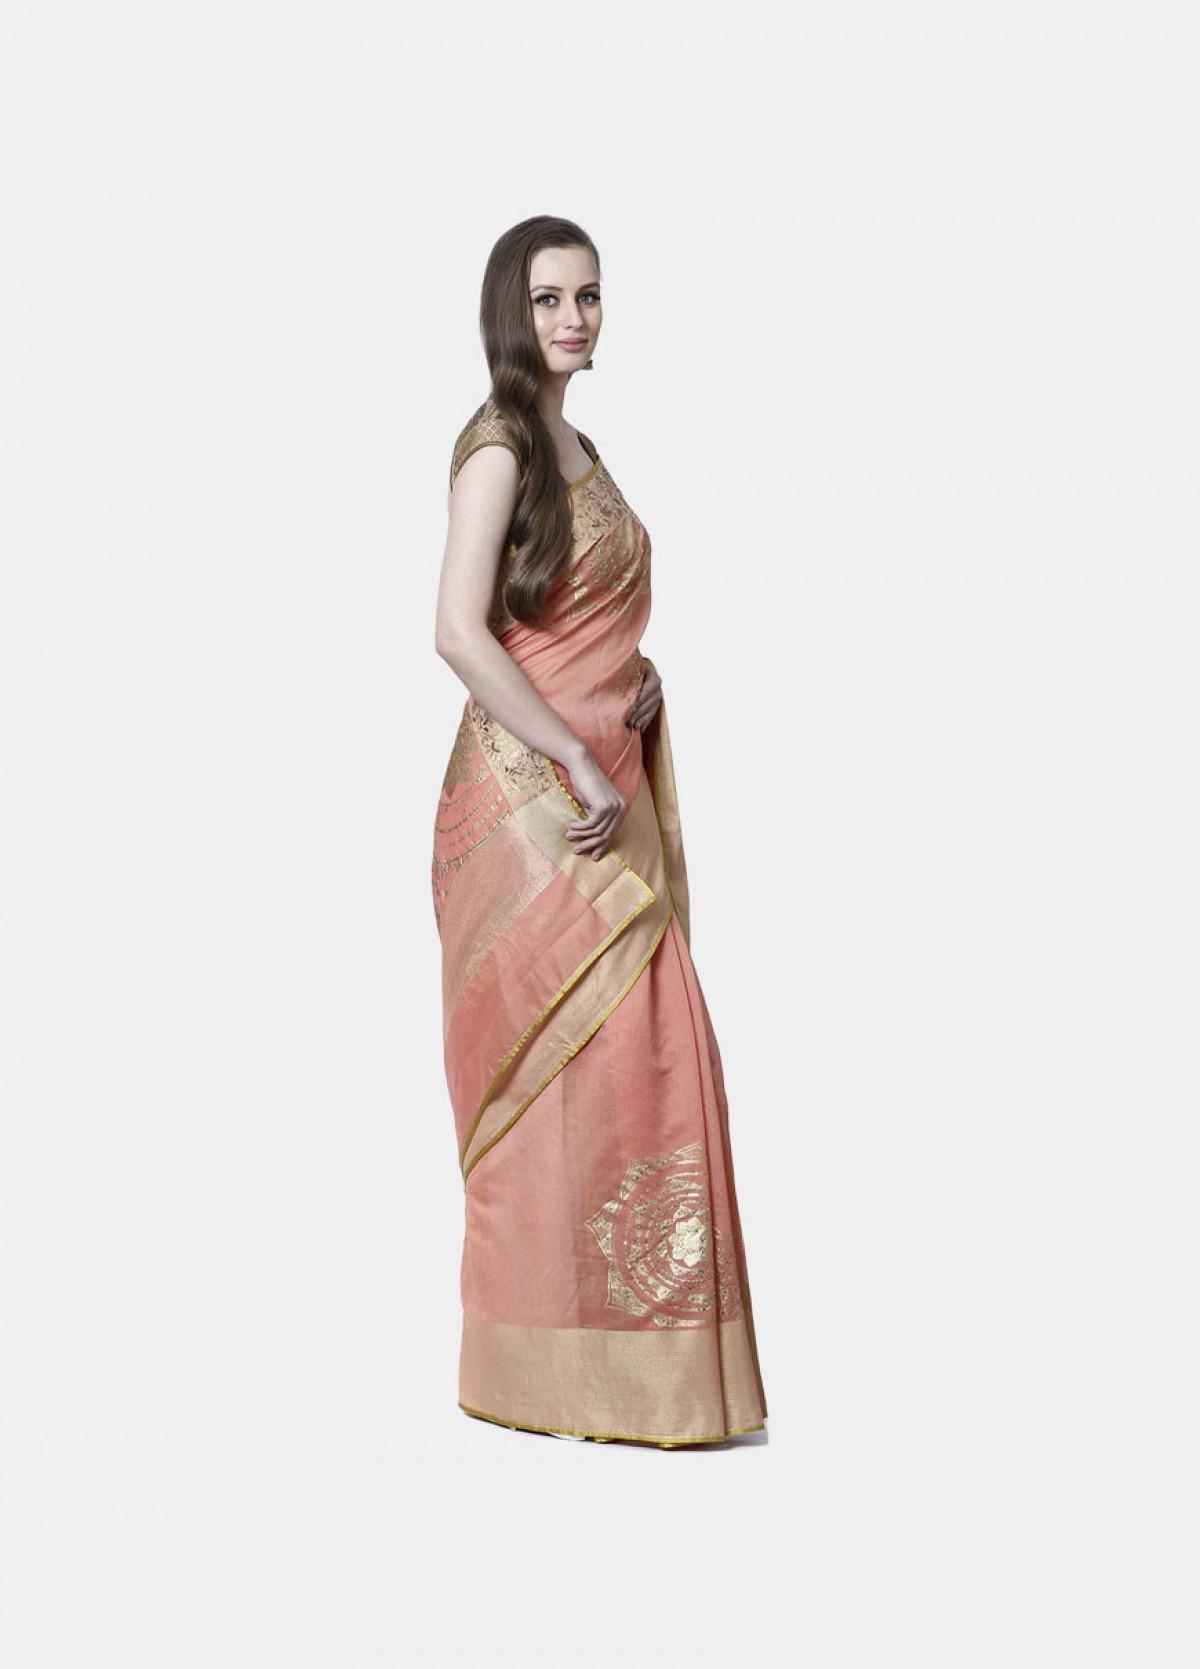 The Radiant mandala Sari